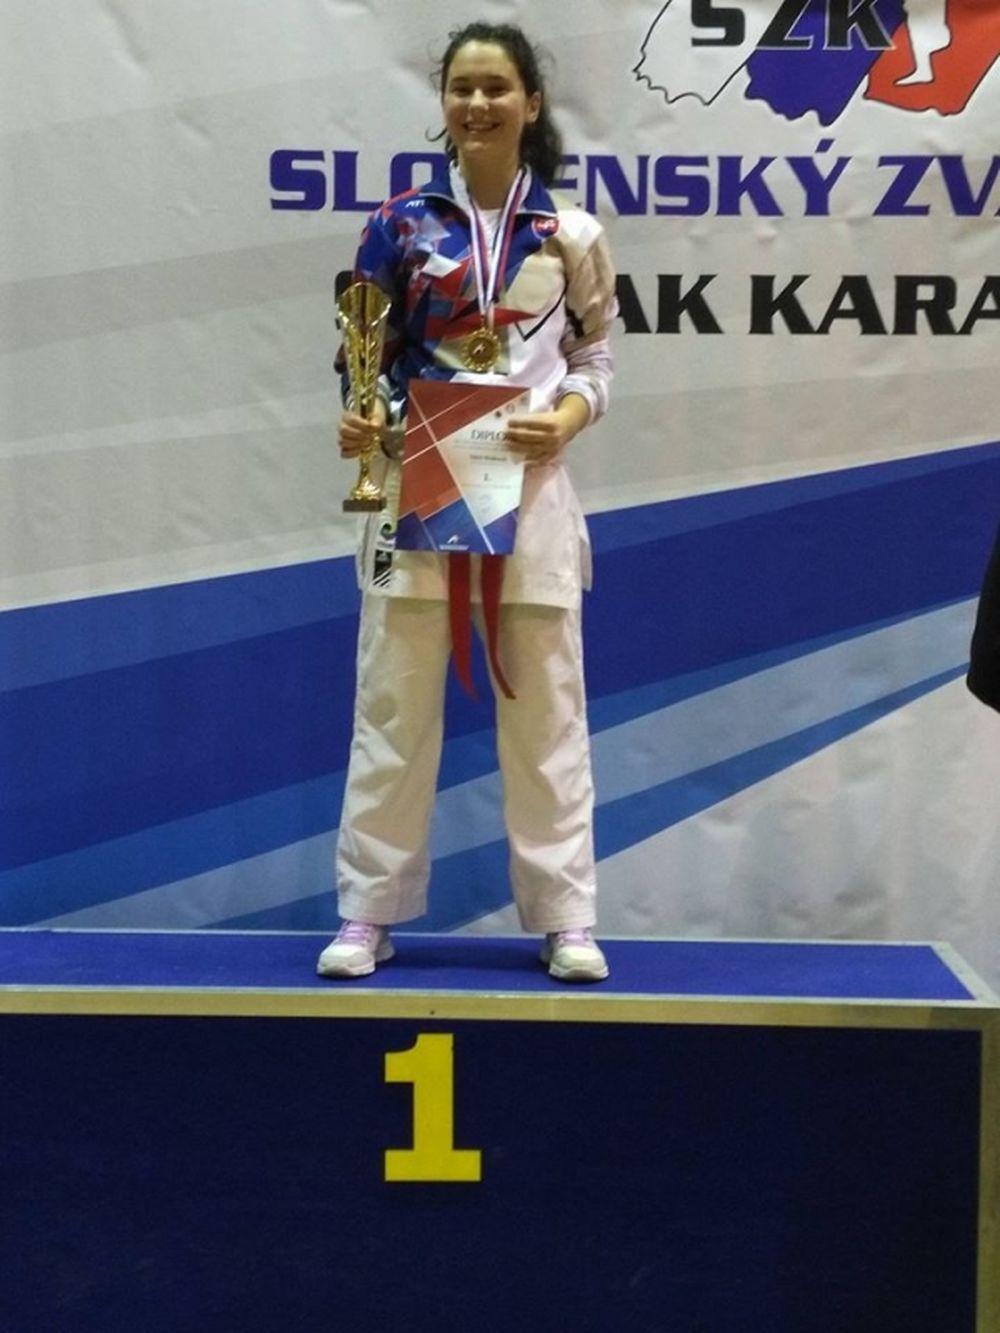 Úspechy Karate klub Žilina Trnava 3.12.2016 - 4.12.2016, foto 3